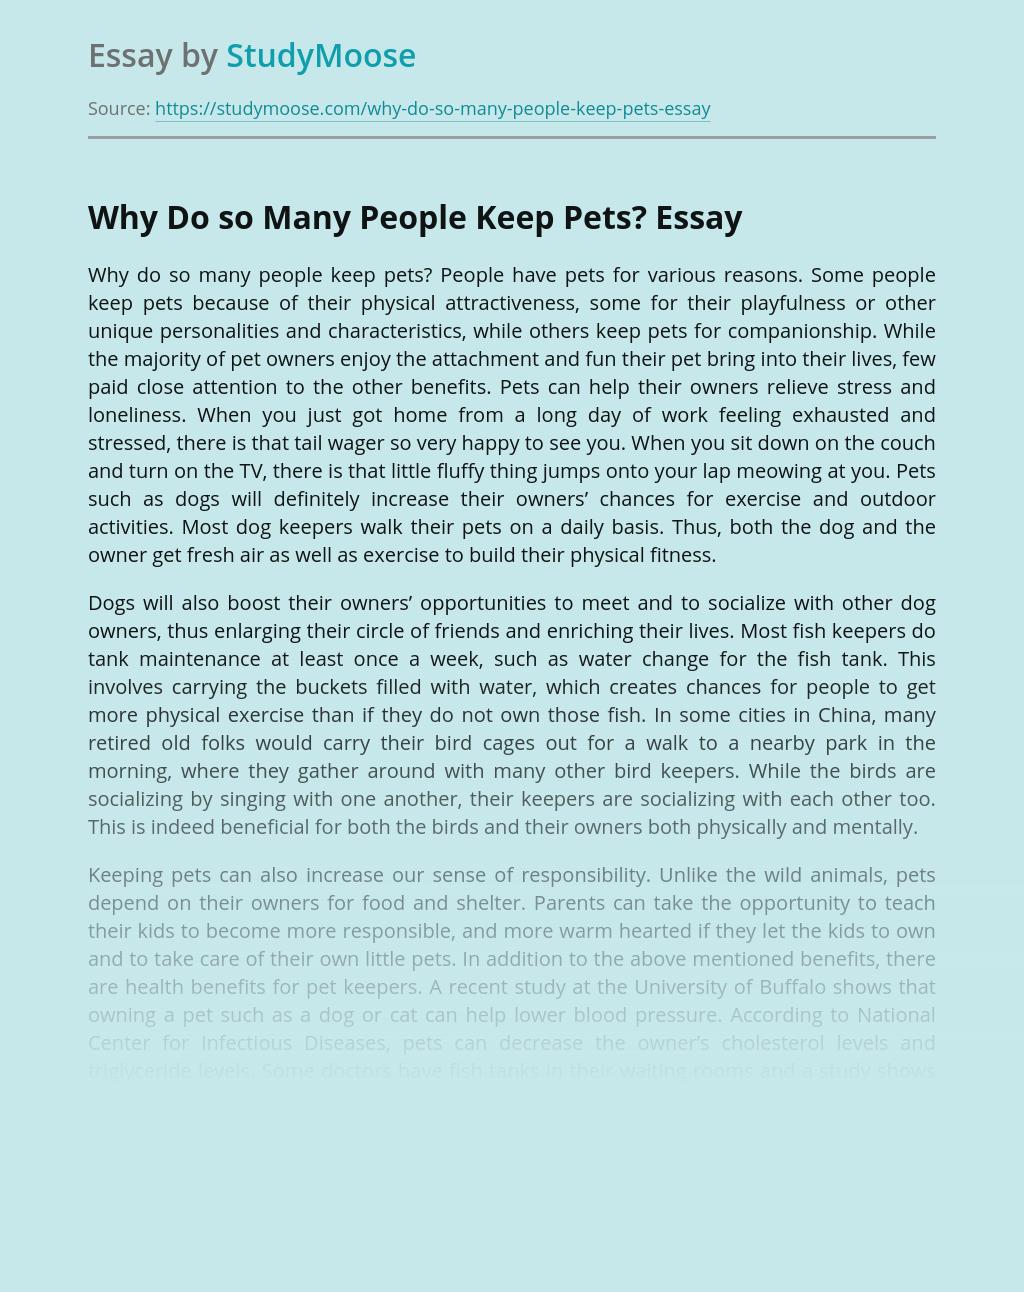 Why Do so Many People Keep Pets?